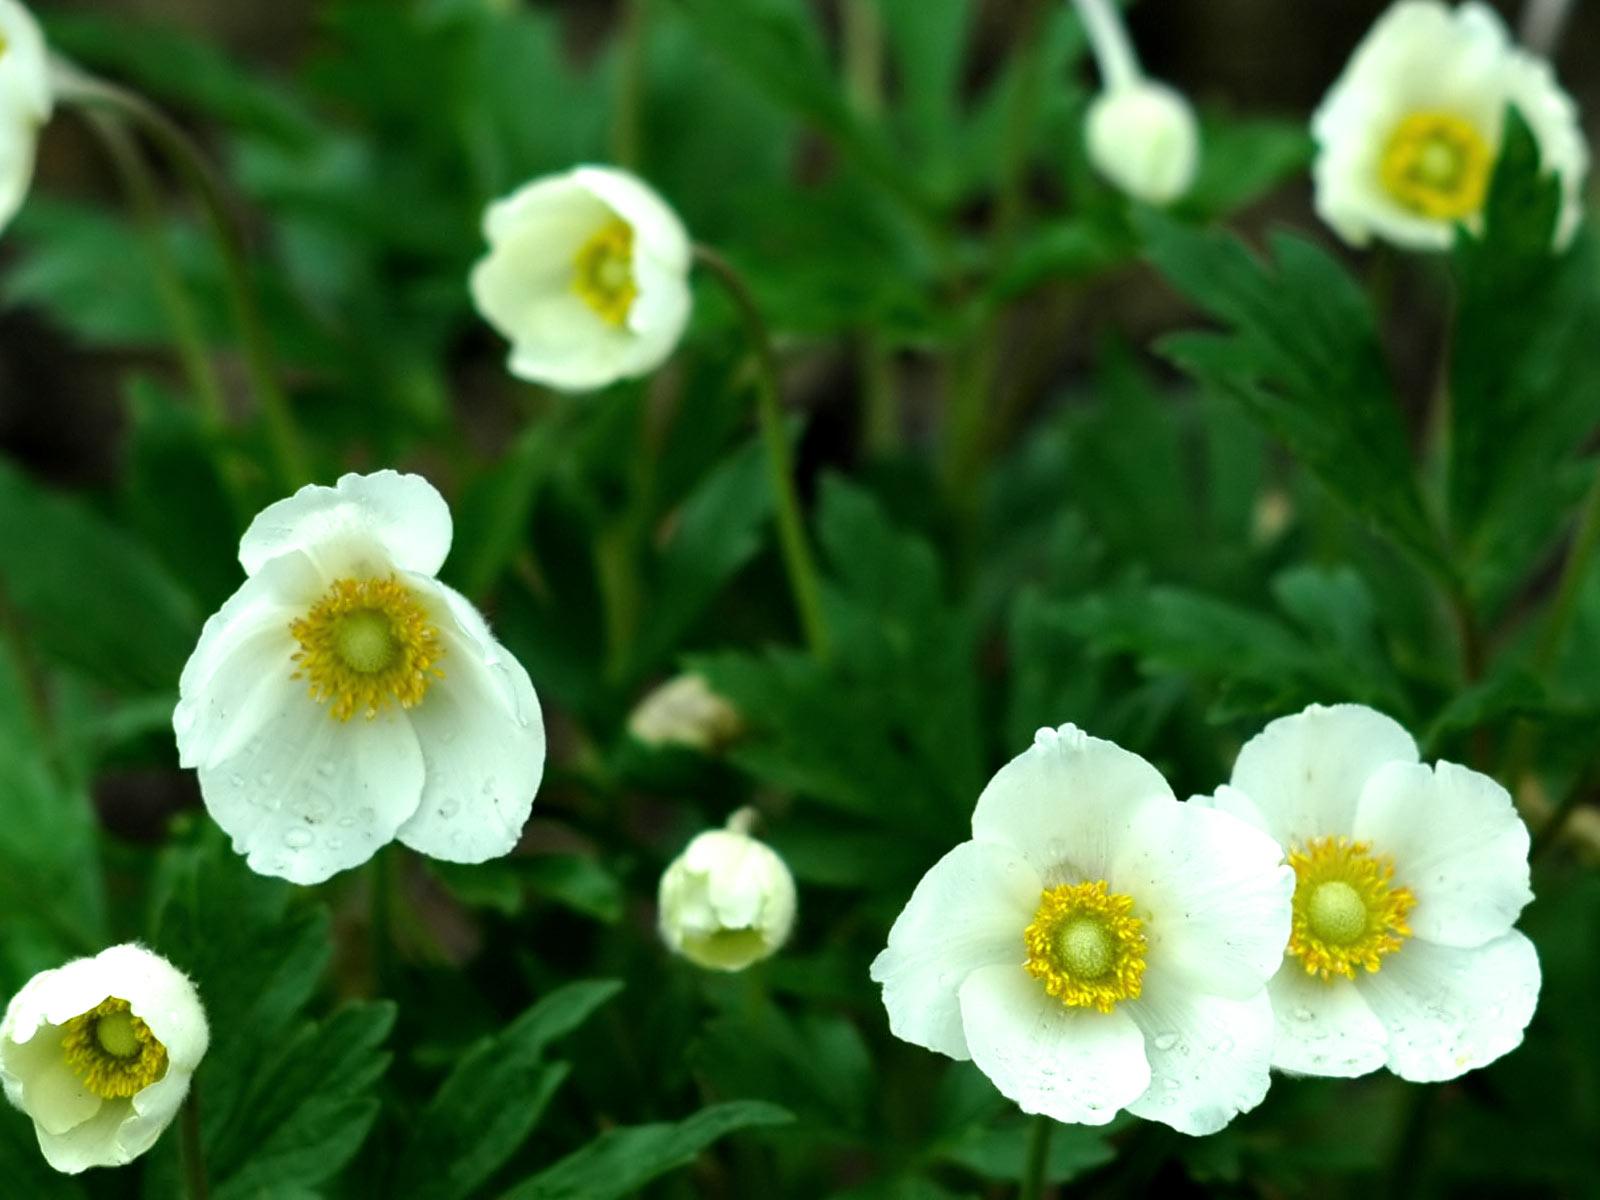 anemone flower 26011